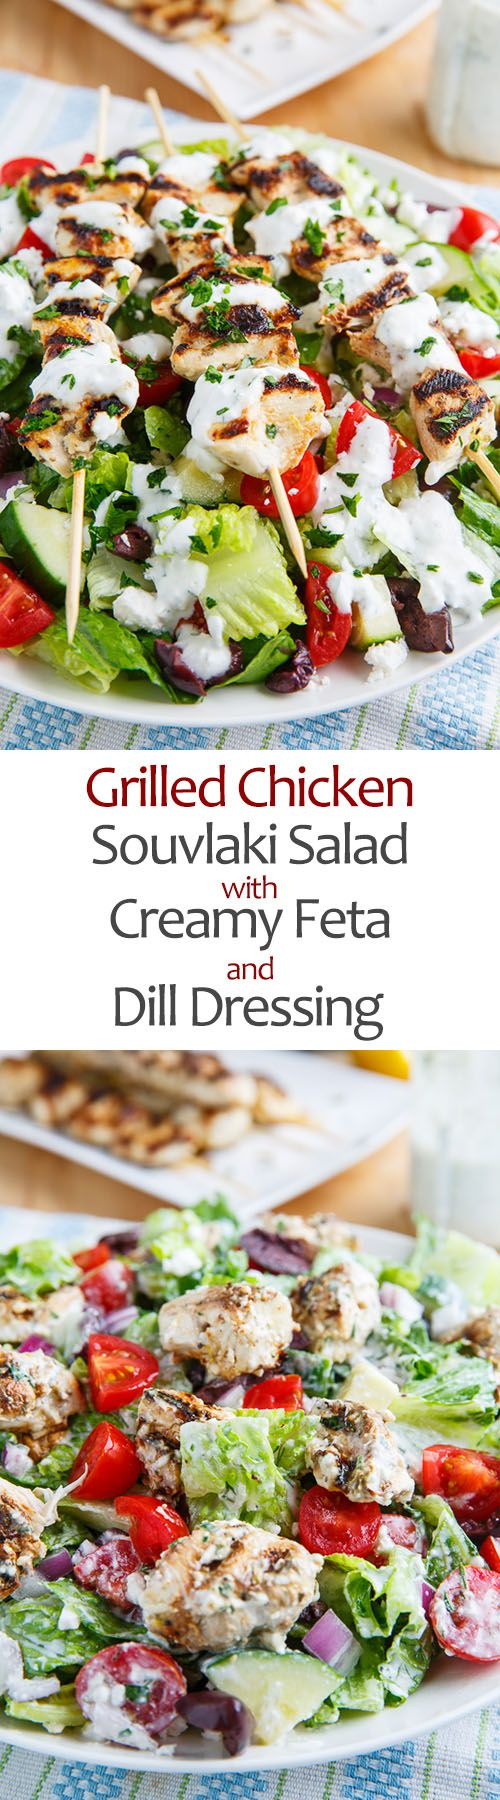 ... and more chicken souvlaki grilled chicken feta salads dressing chicken